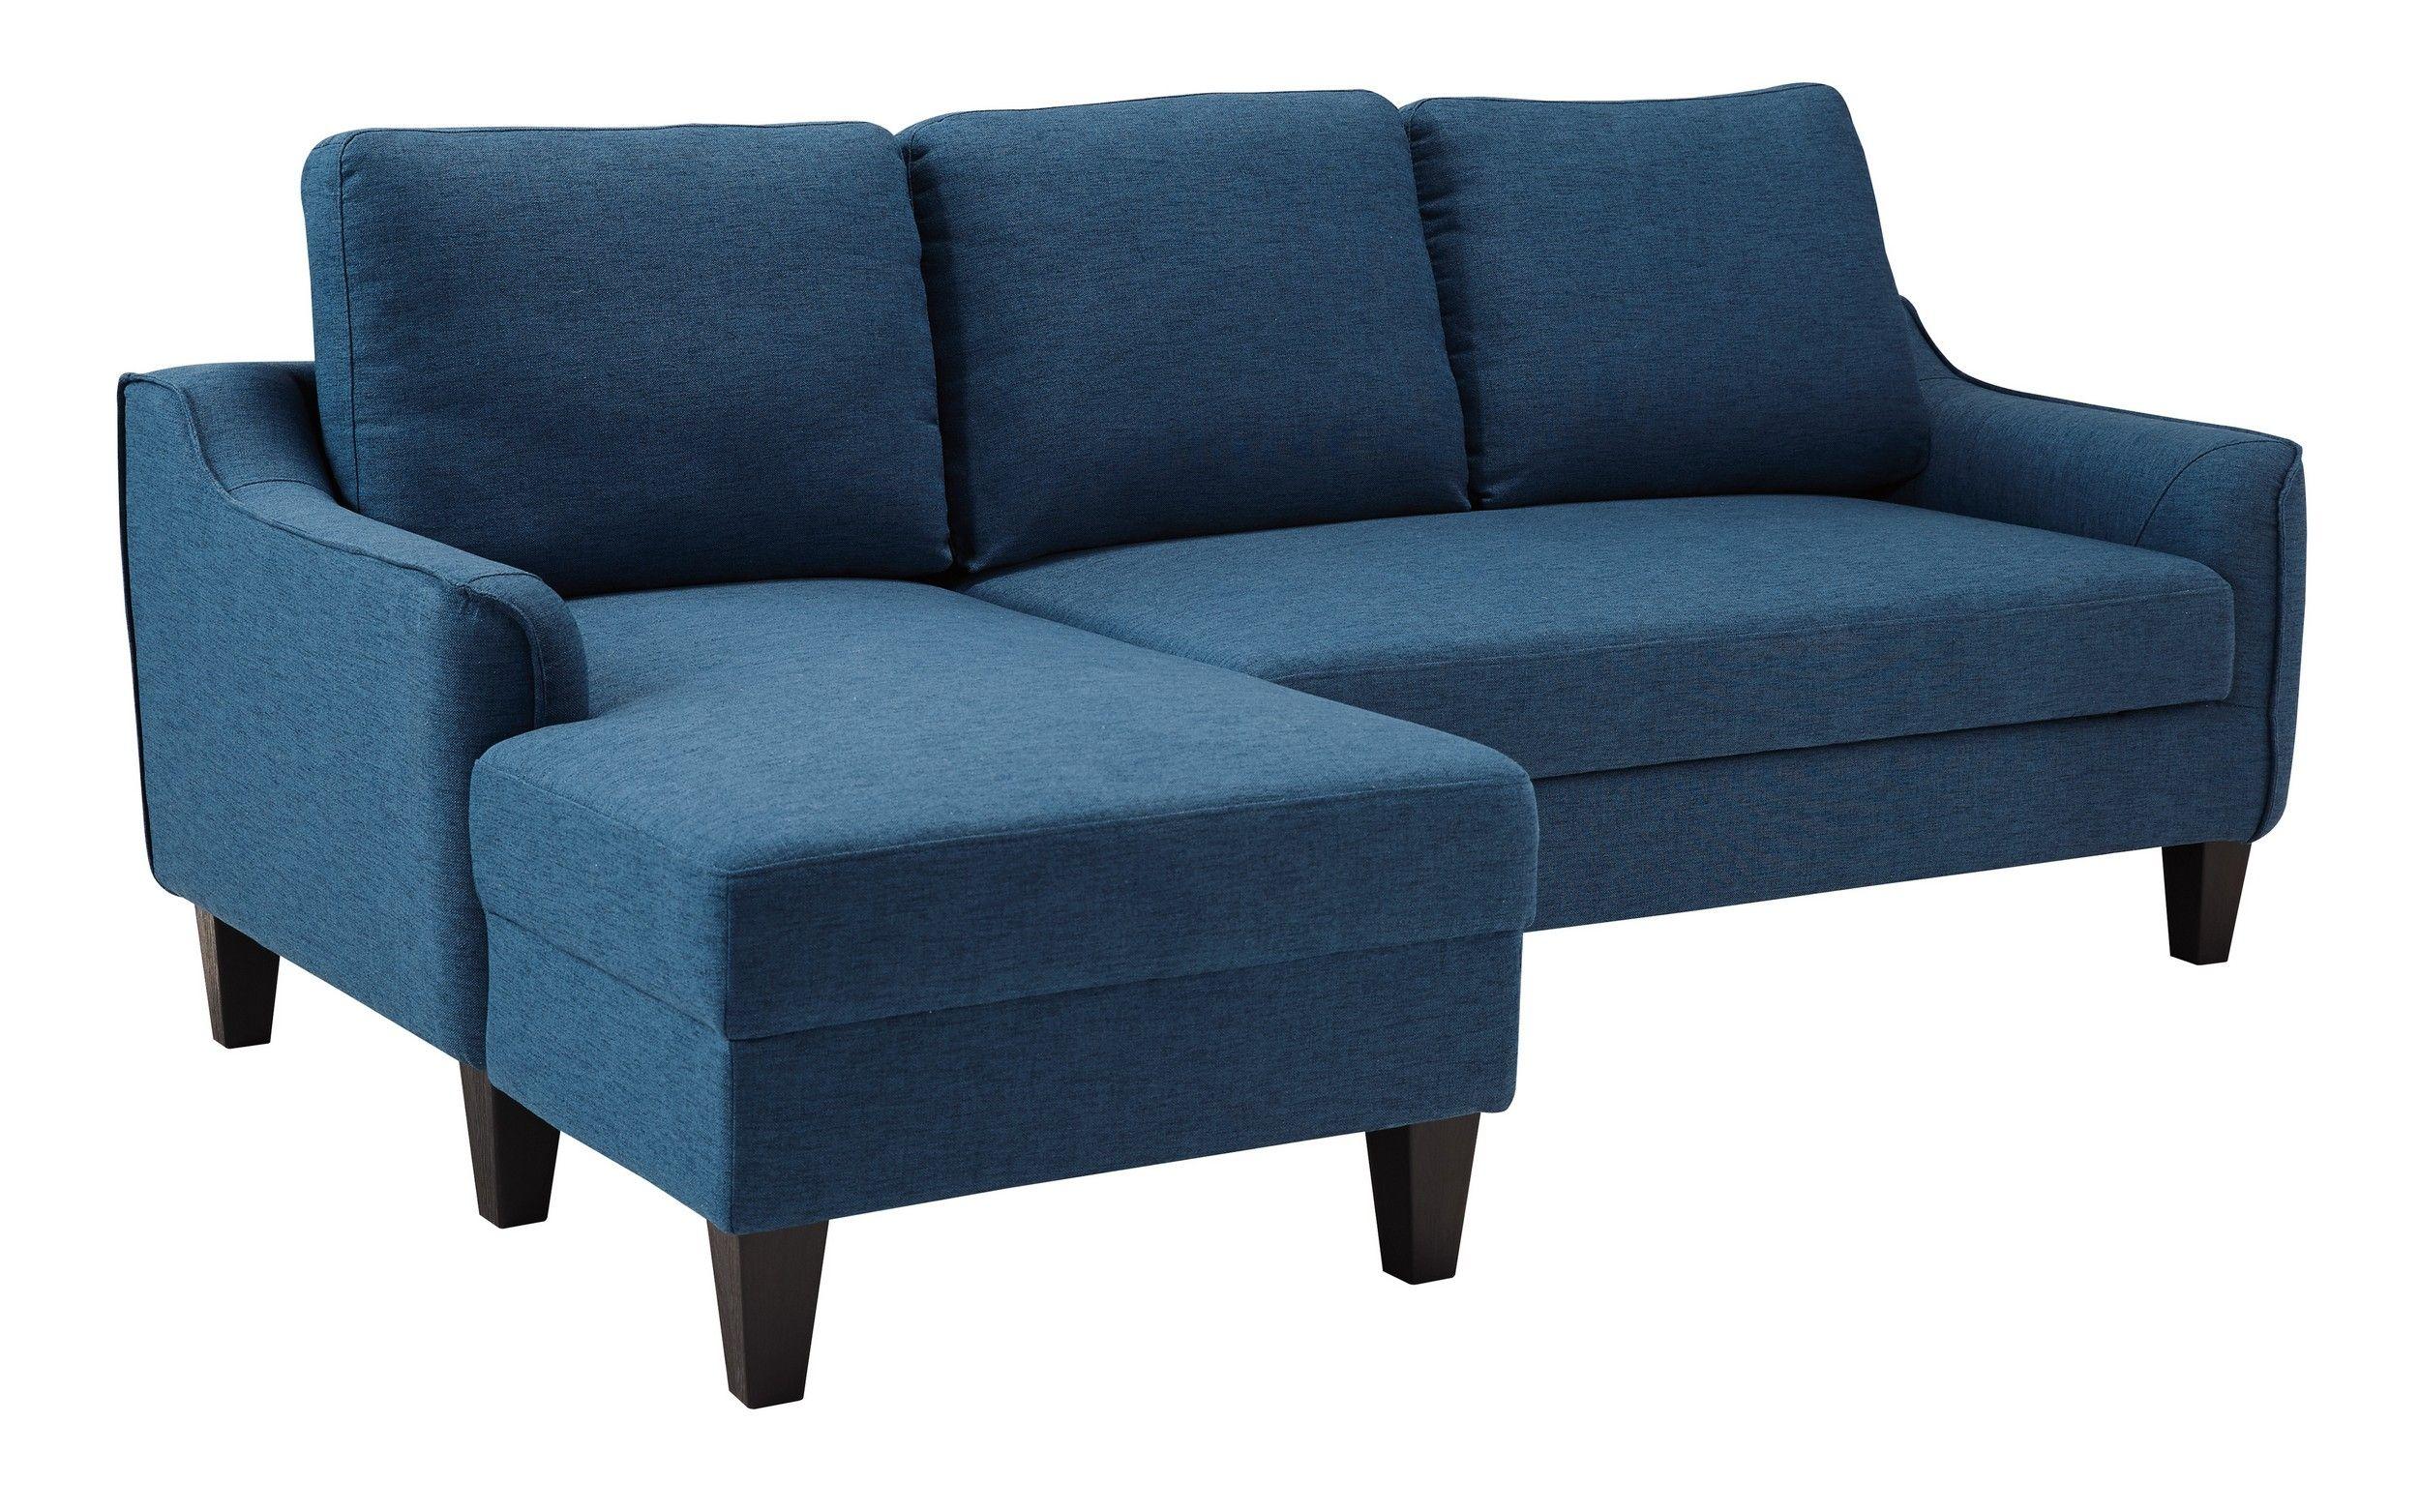 Signature Design By Ashley Jarreau Blue Sleeper Sofa Chaise Reviews Goedekers Com Sofa Bed Blue Sectional Sleeper Sofa Chaise Sofa